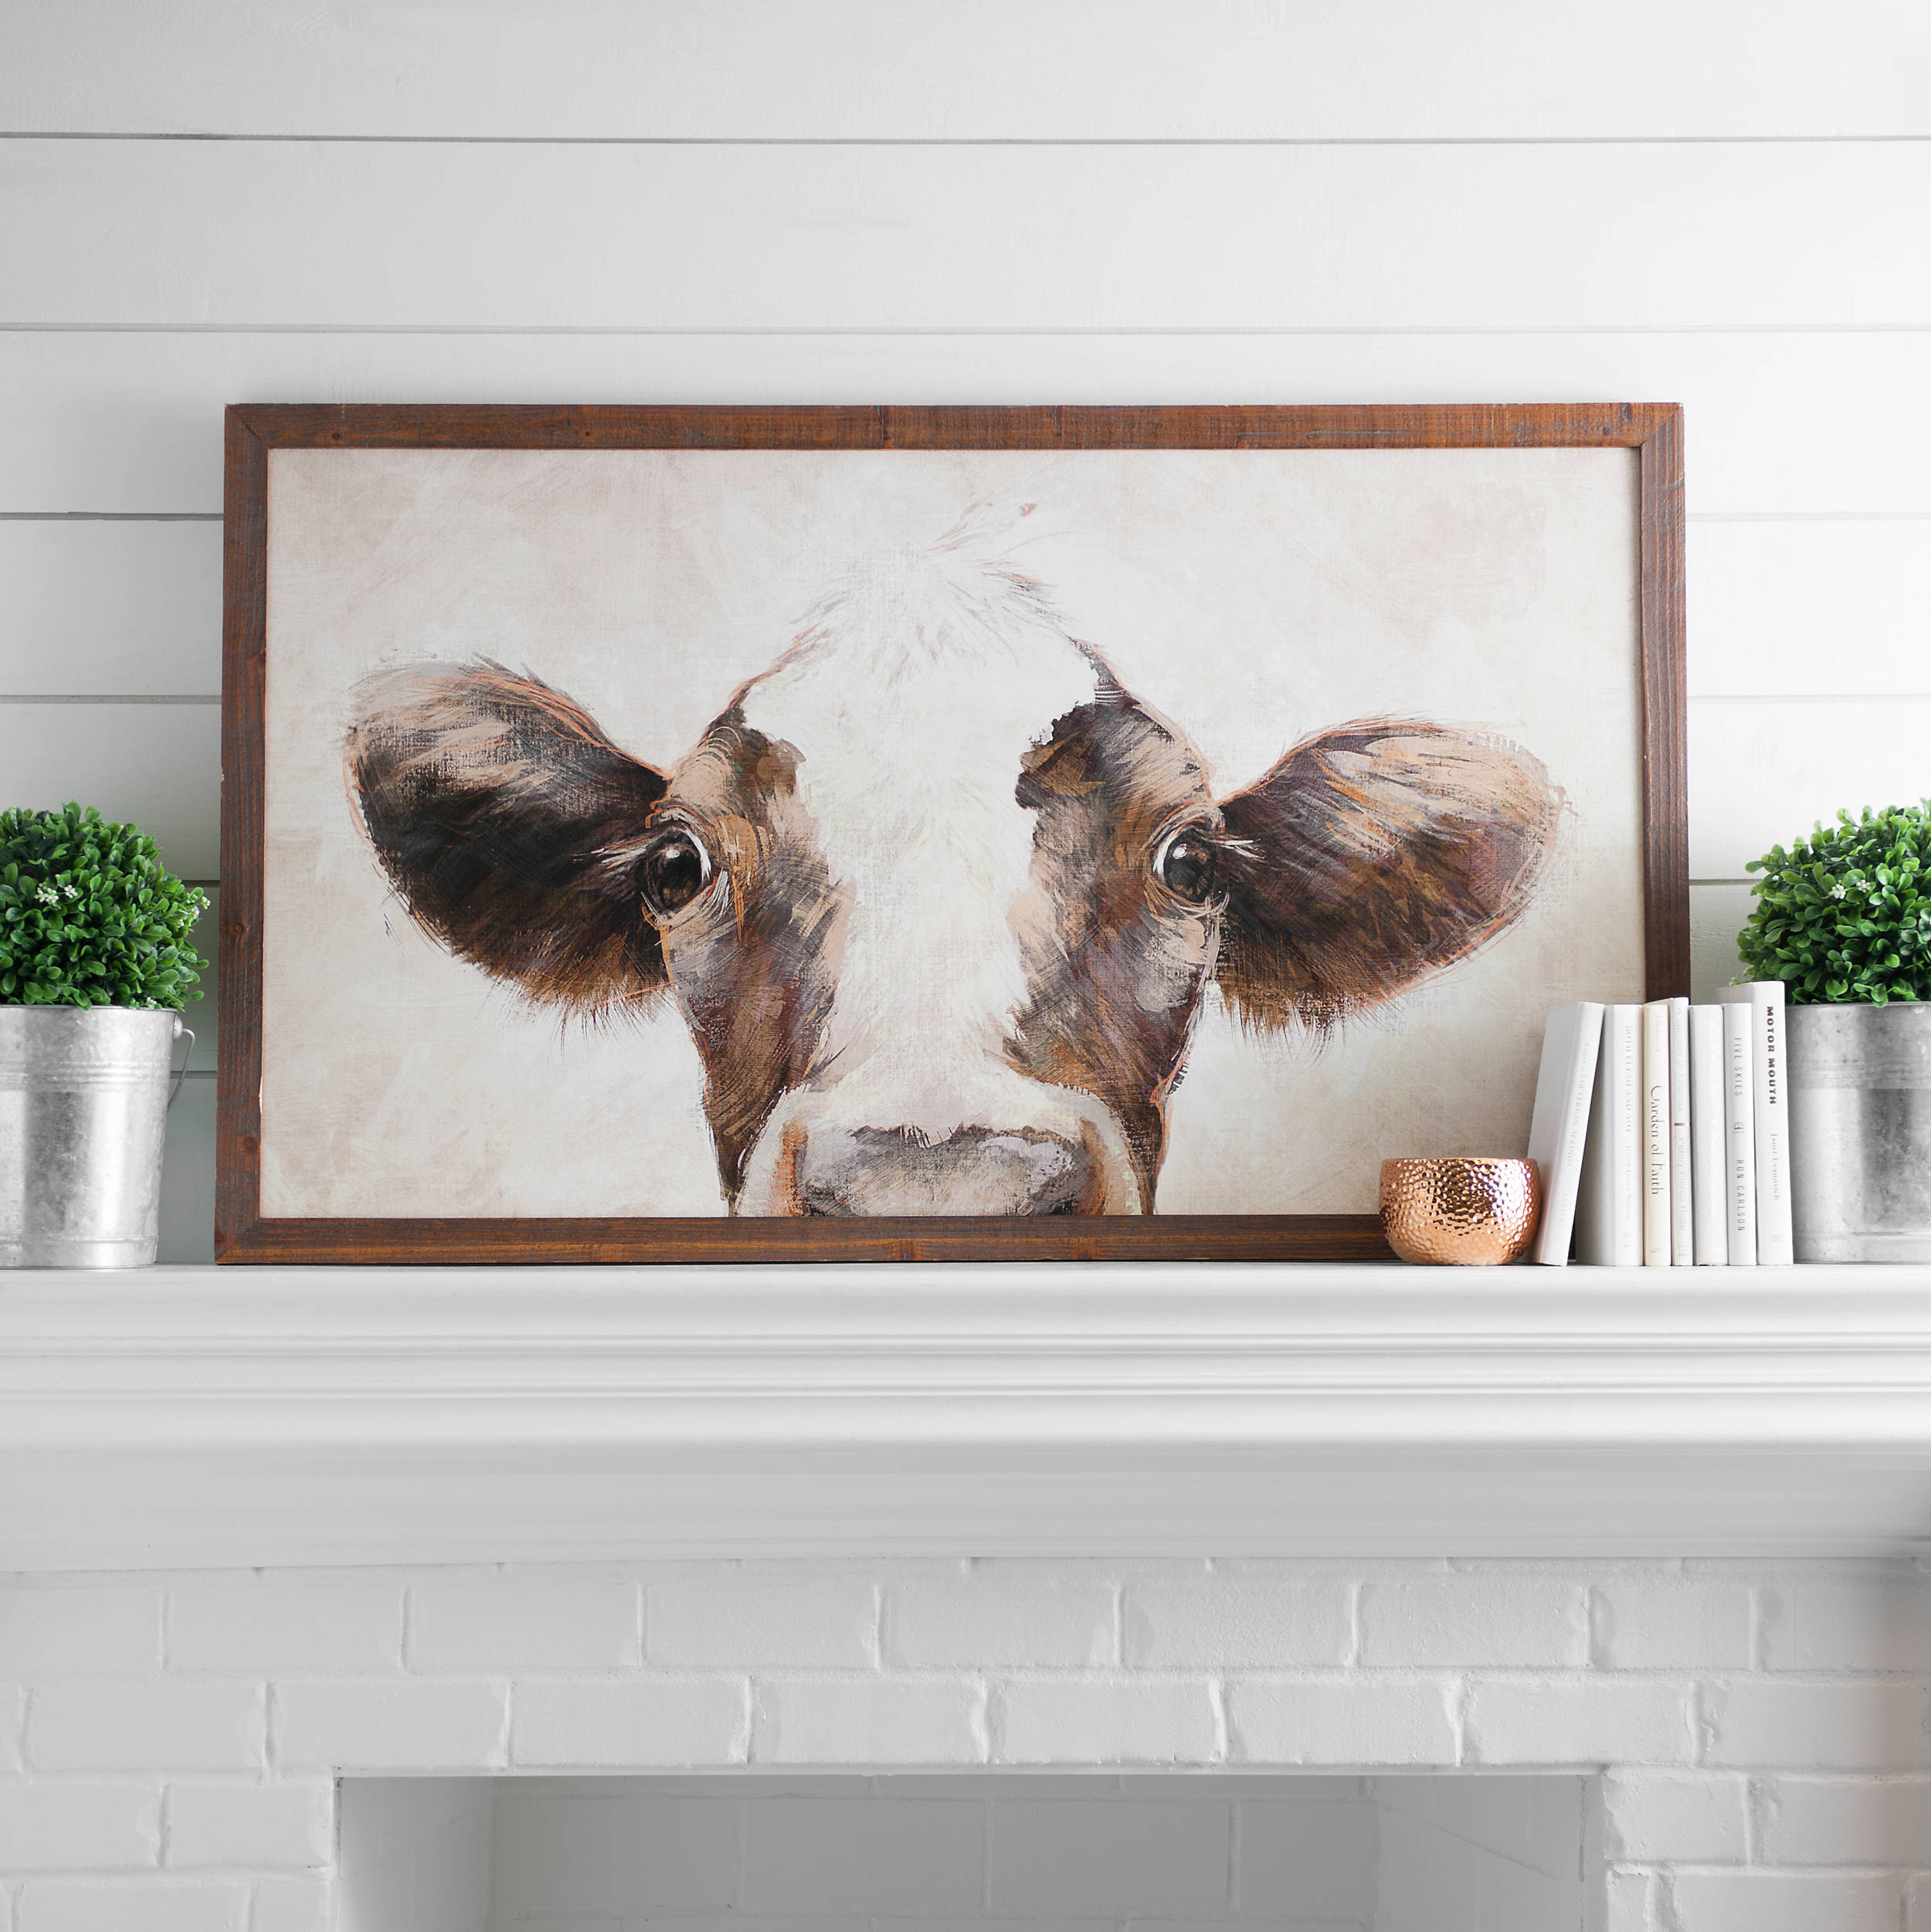 Shop Chocolate Milk Framed Art Print from Kirkland's on Openhaus